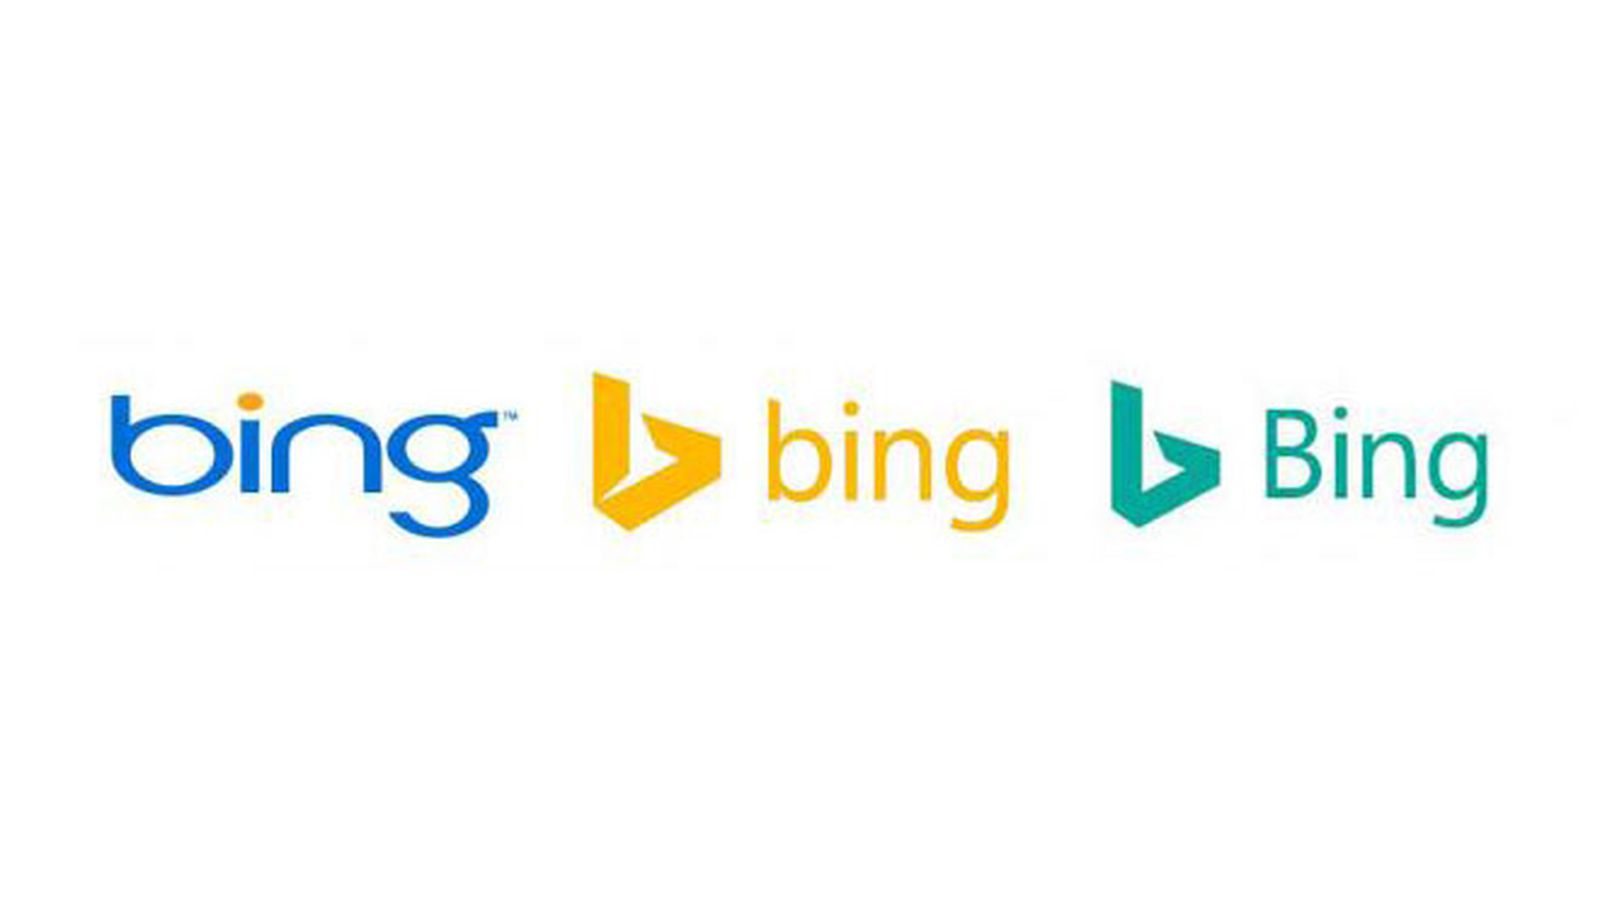 Microsoft Updates Bing Logo As It Reasserts Commitment To